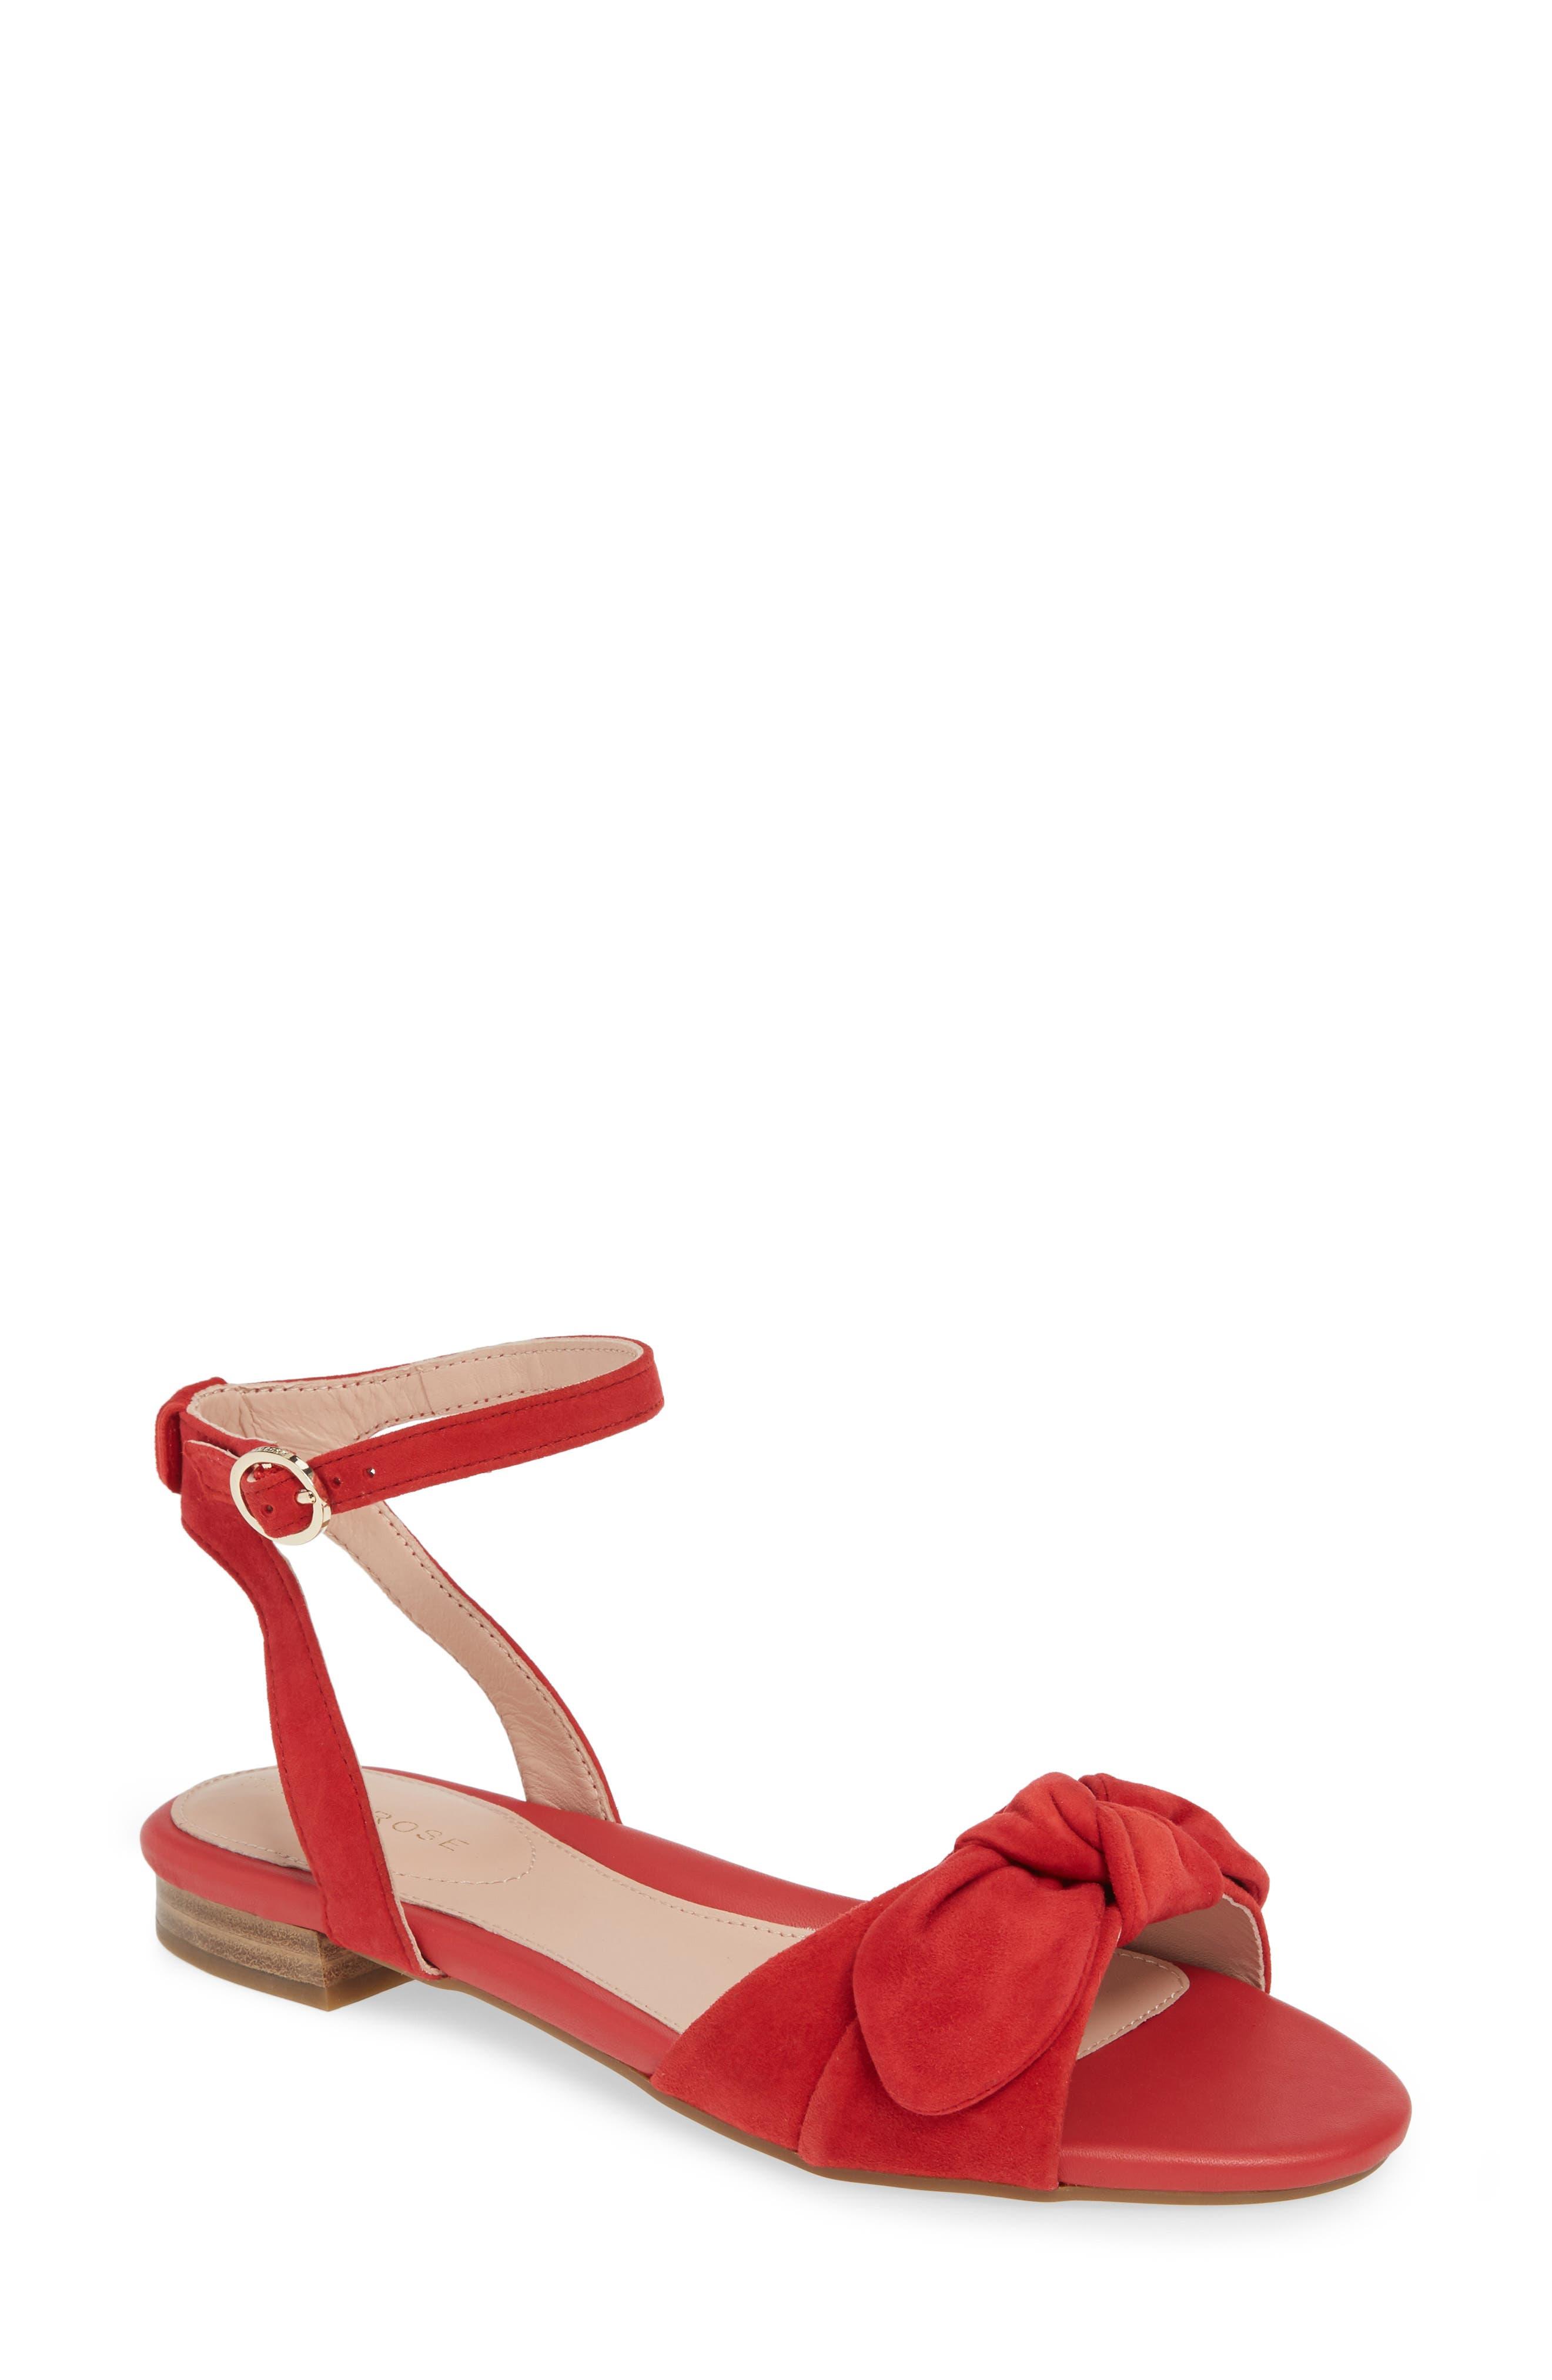 Taryn Rose Vivian Ankle Strap Sandal, Red